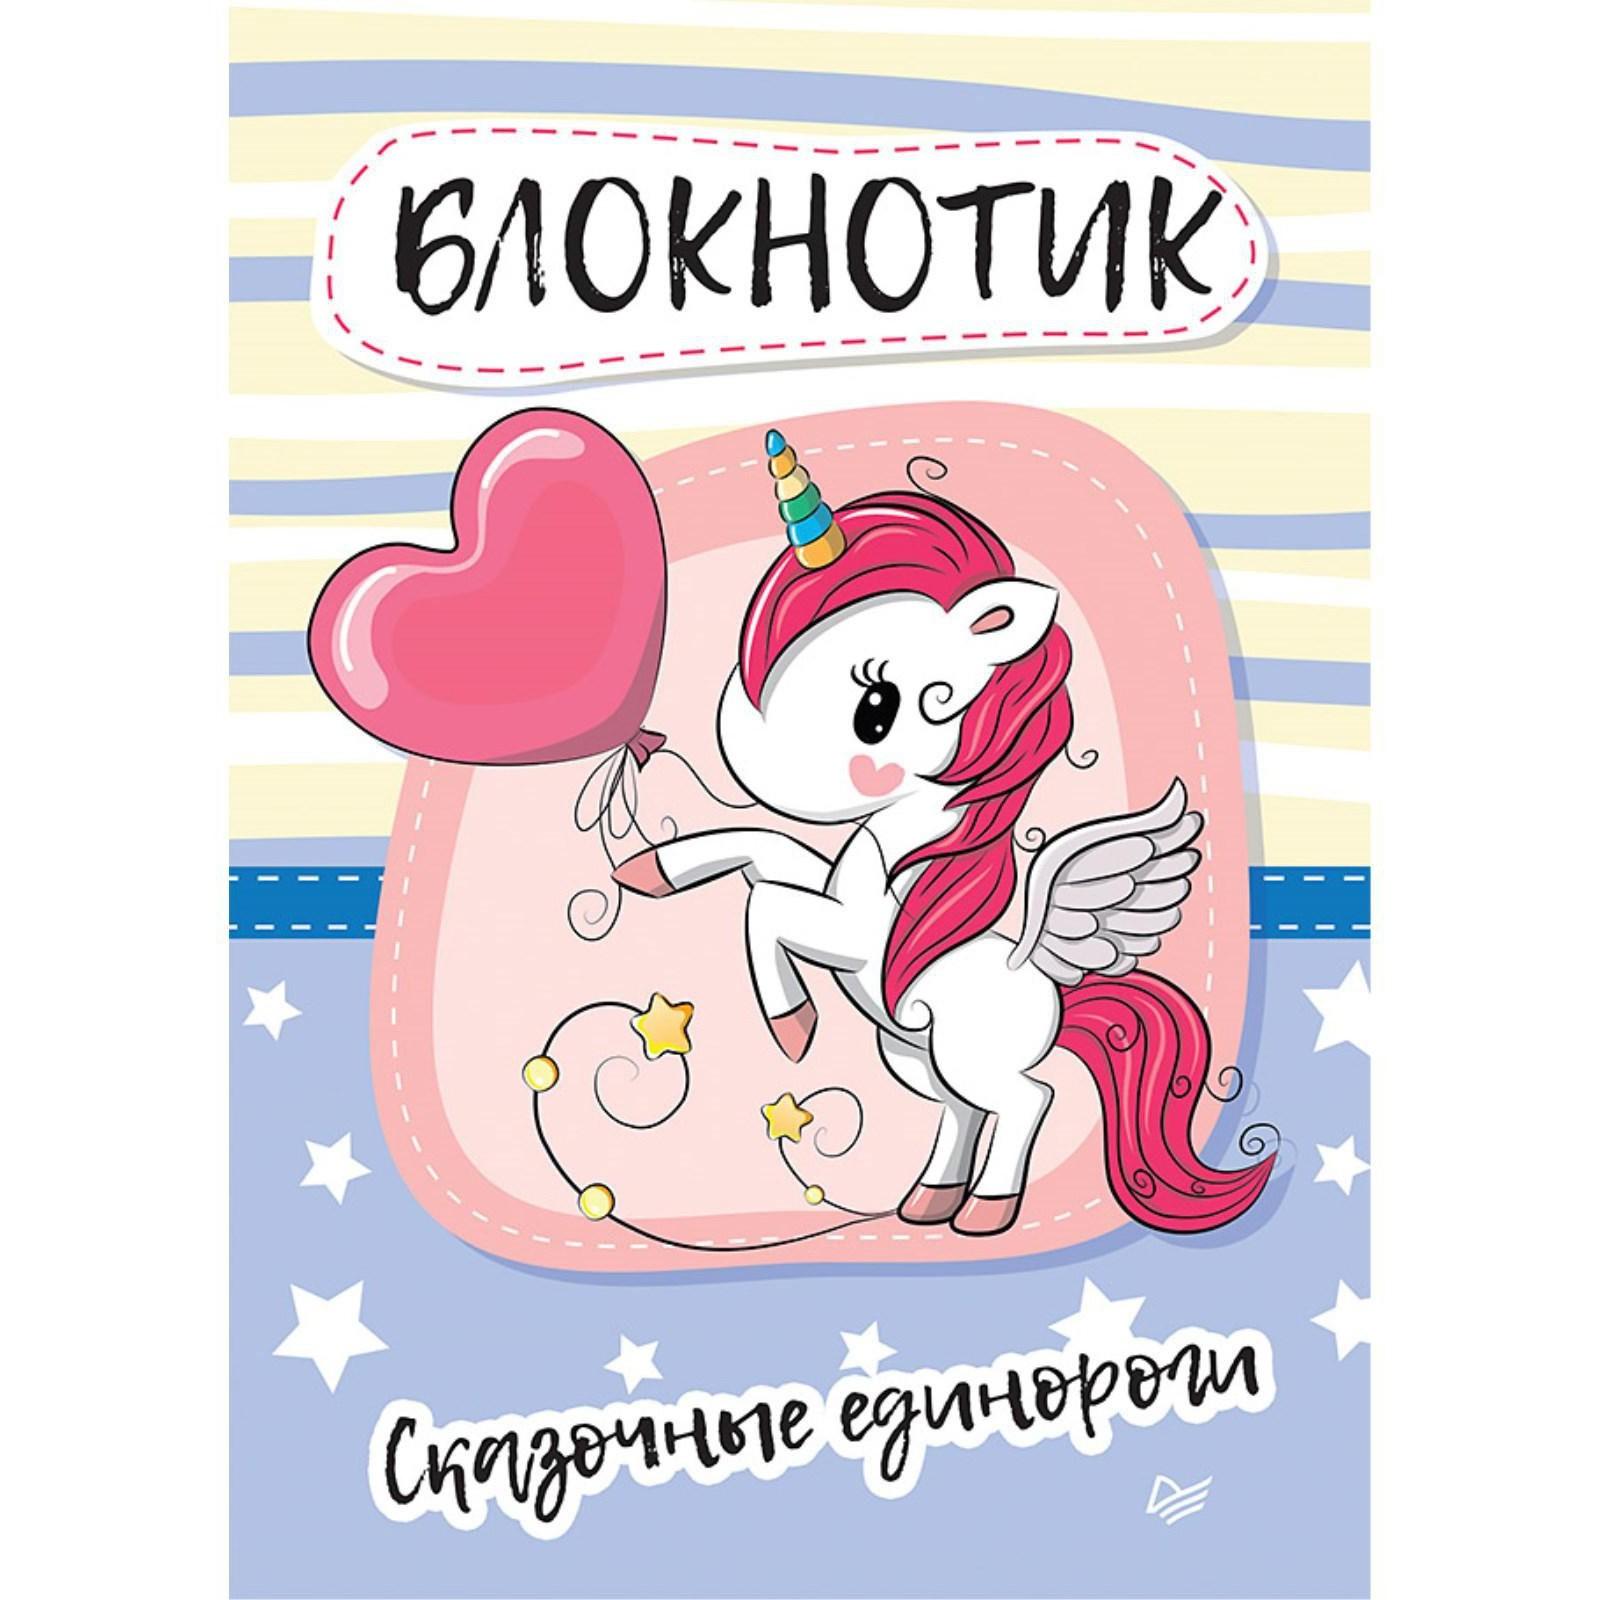 Блокнот Питер Блокнотик Сказочные единороги